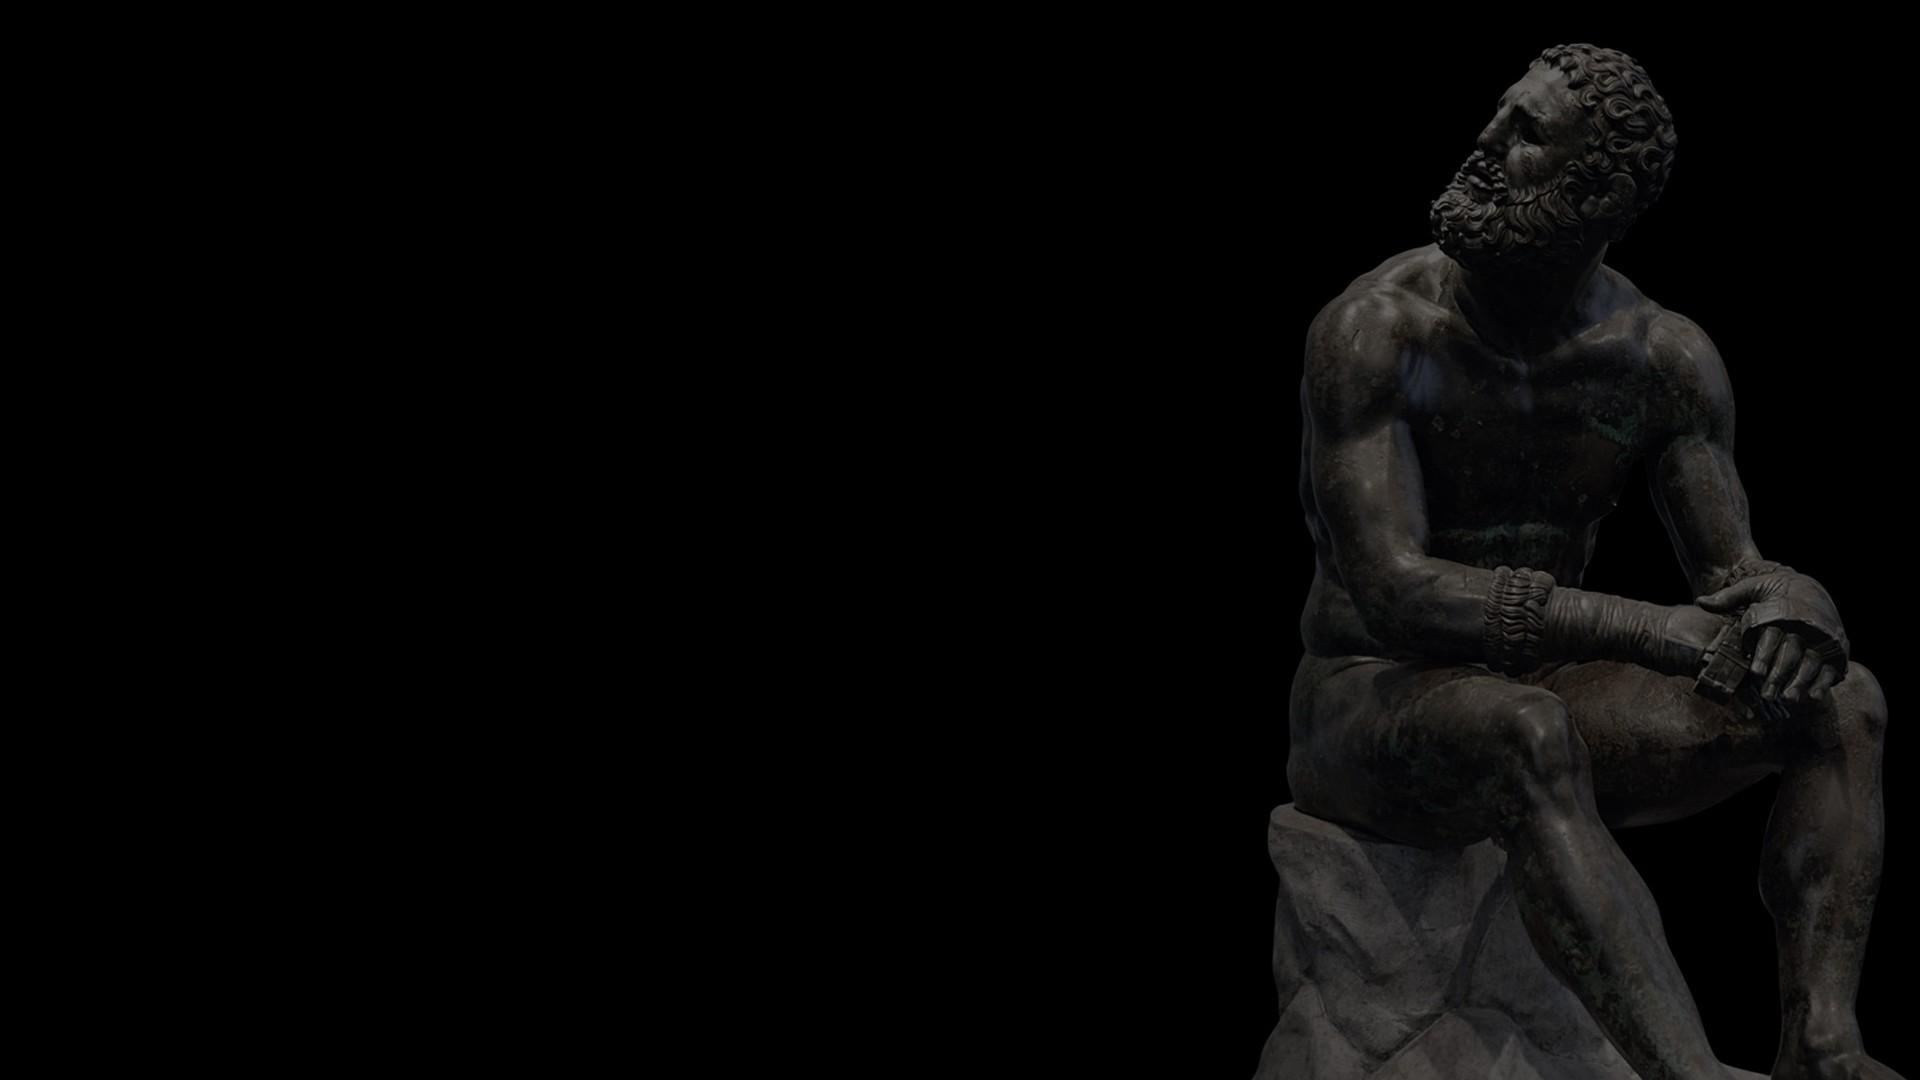 Fondos De Pantalla : Escultura, Estatua, Filosofía